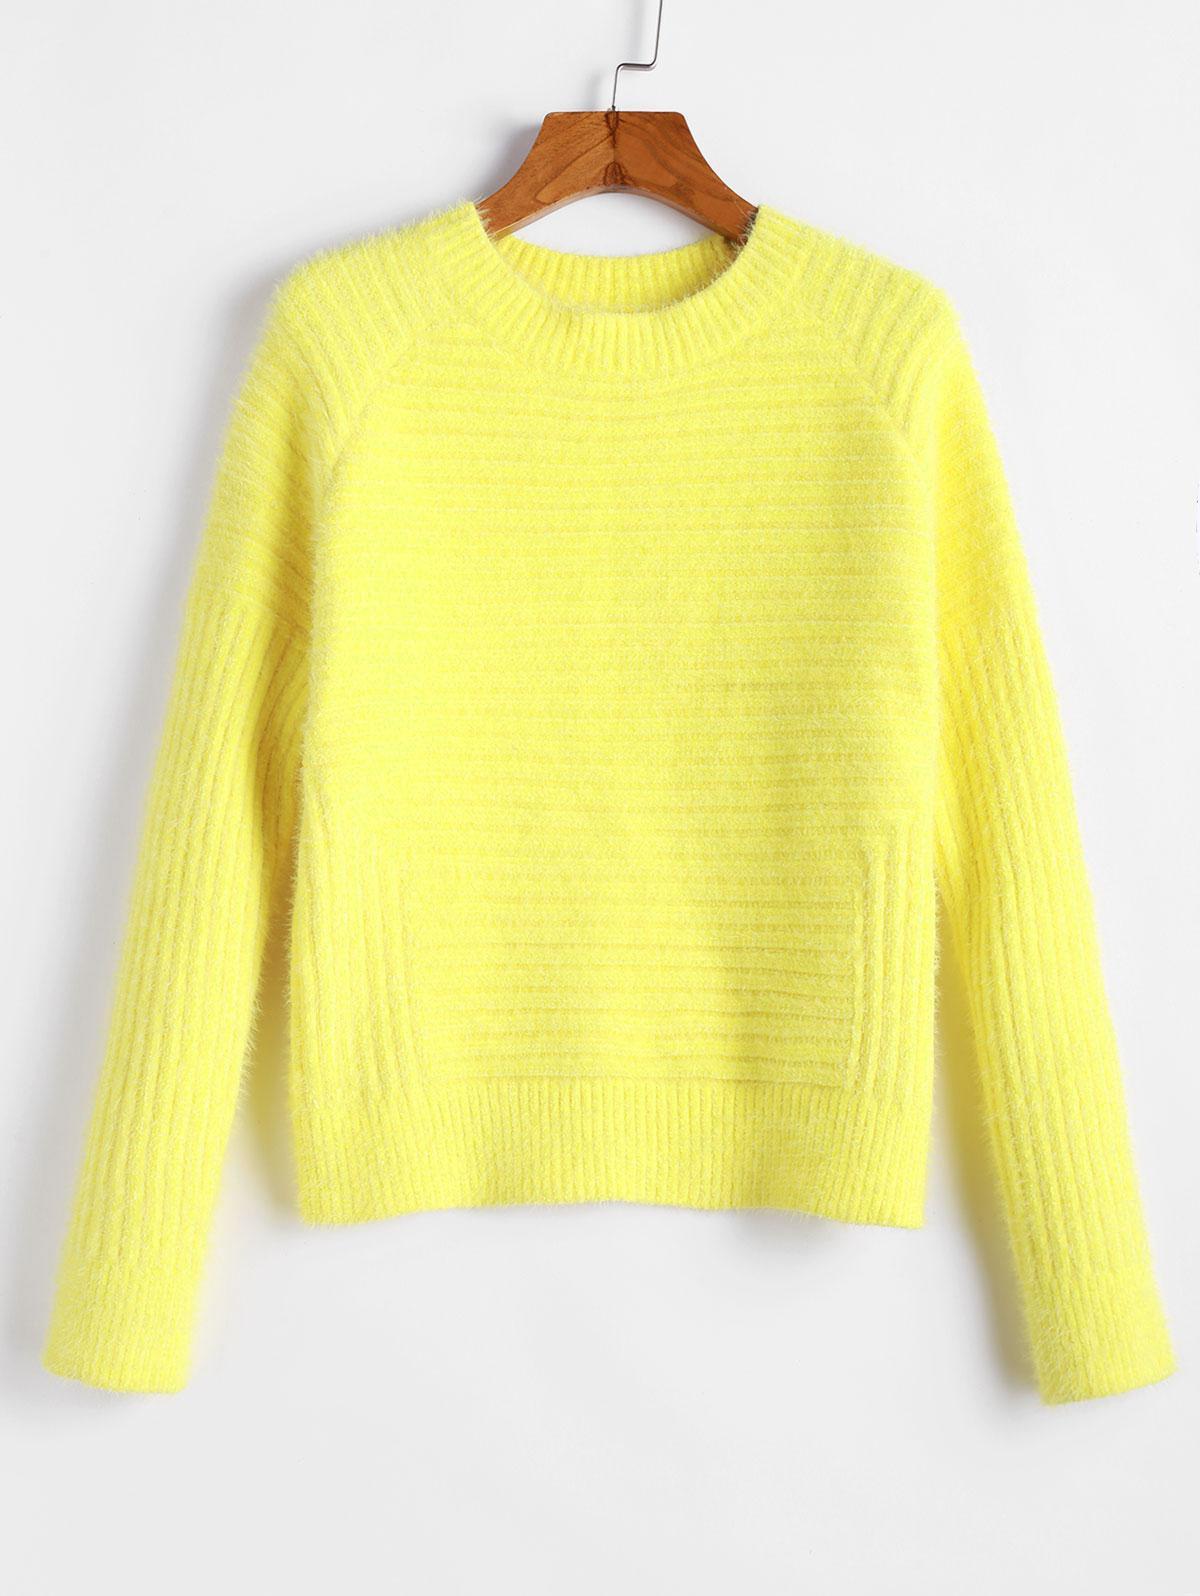 ZAFUL Raglan Sleeves Solid Crop Fluffy Sweater, Yellow